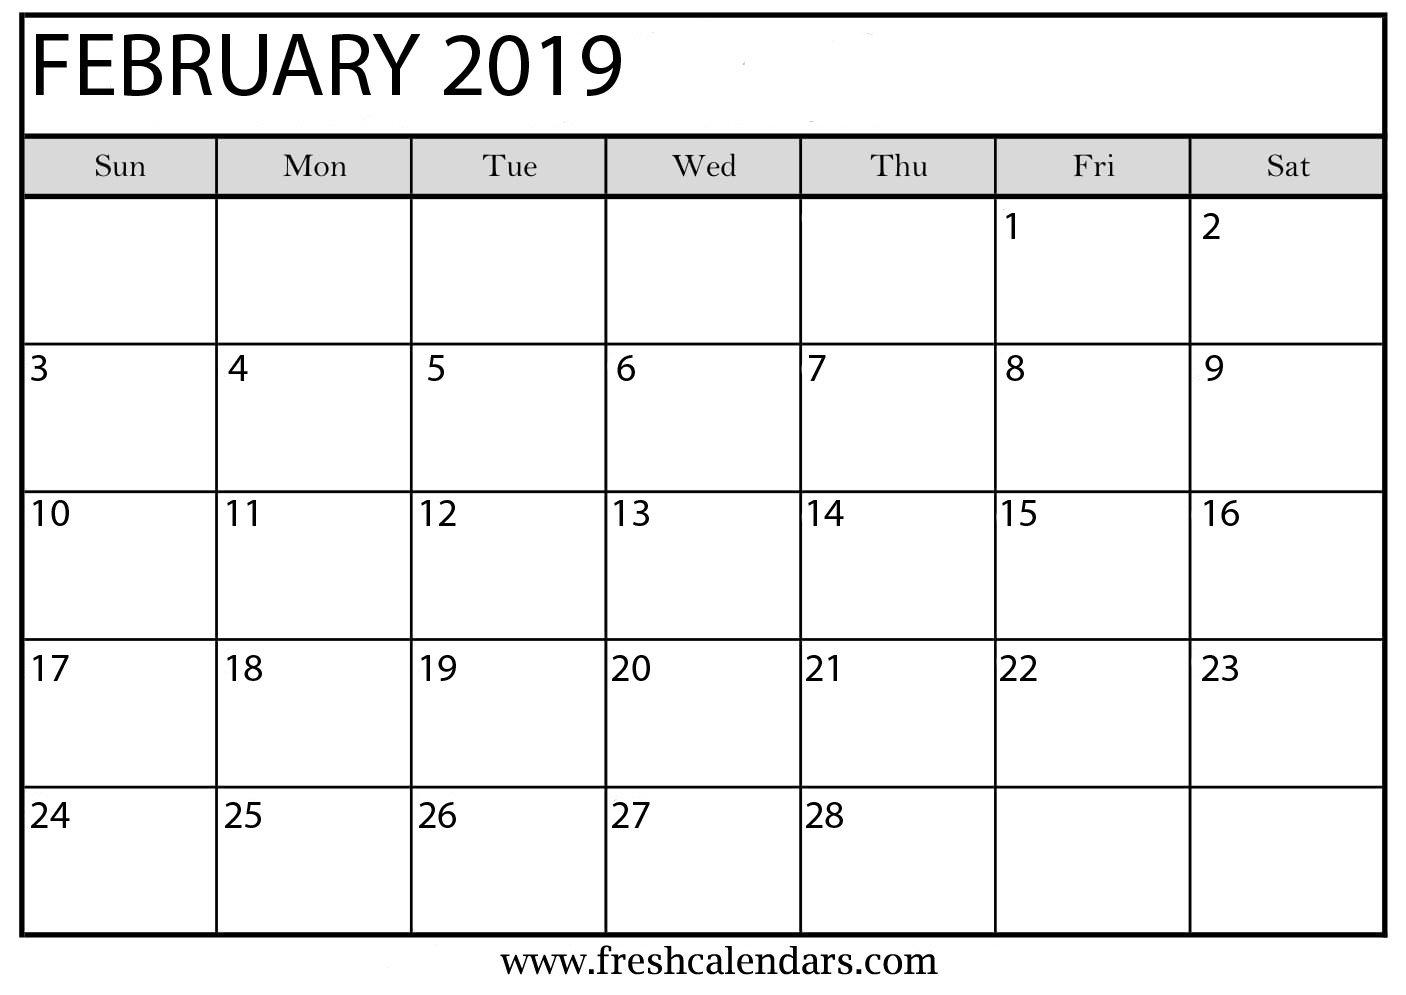 February 2019 Printable Calendars – Fresh Calendars Calendar 2019 February Printable